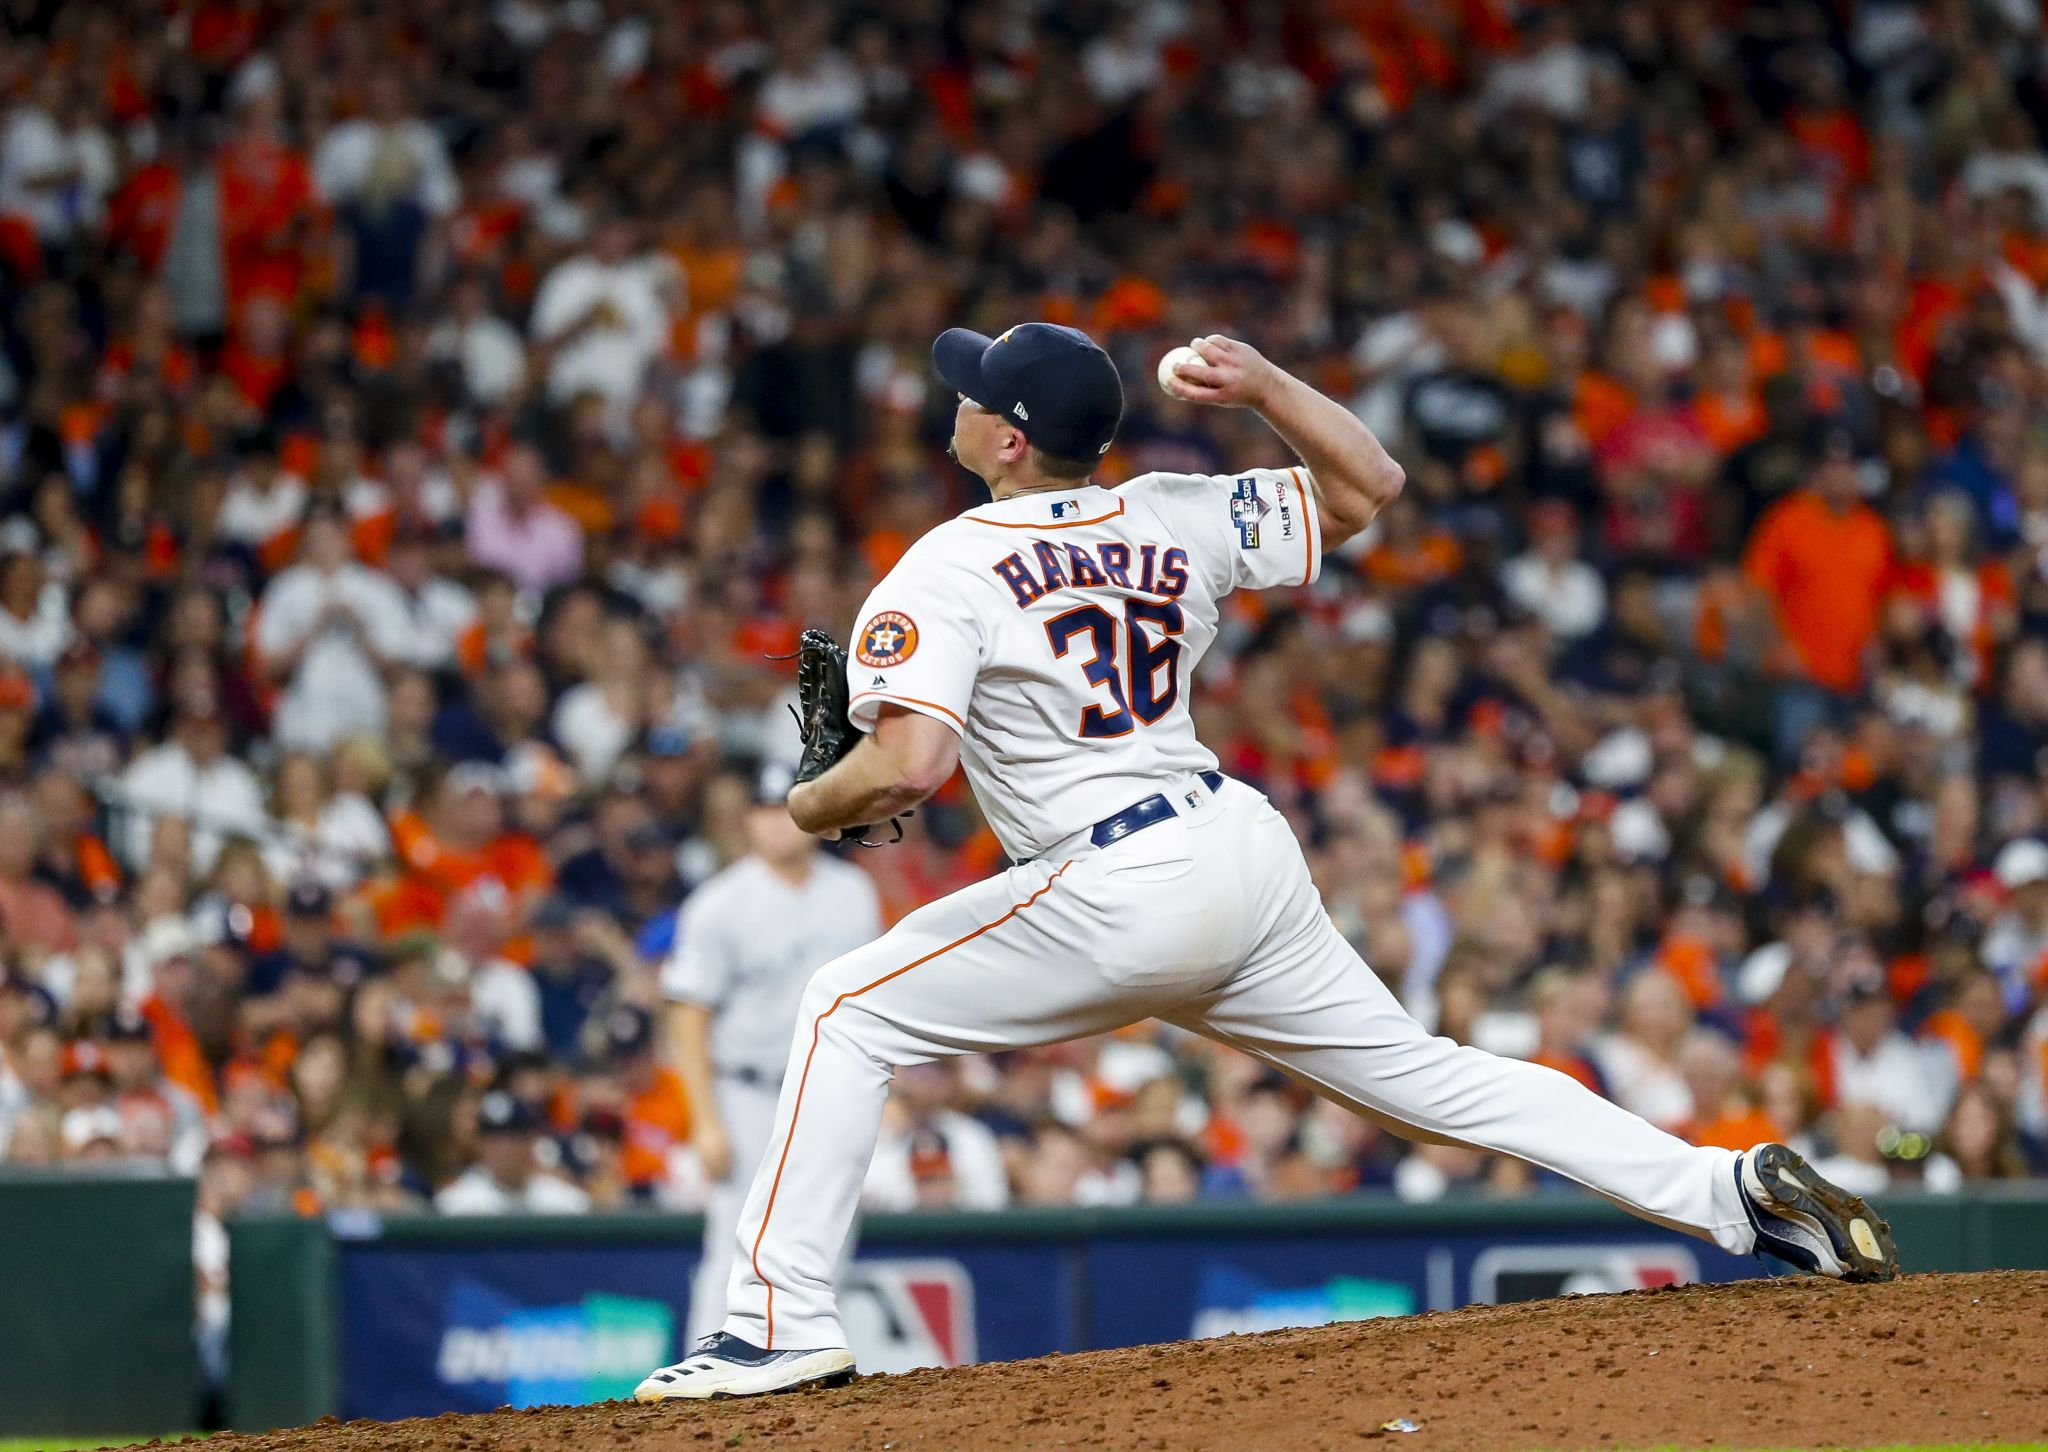 Astros insider: A bullpen day bodes well